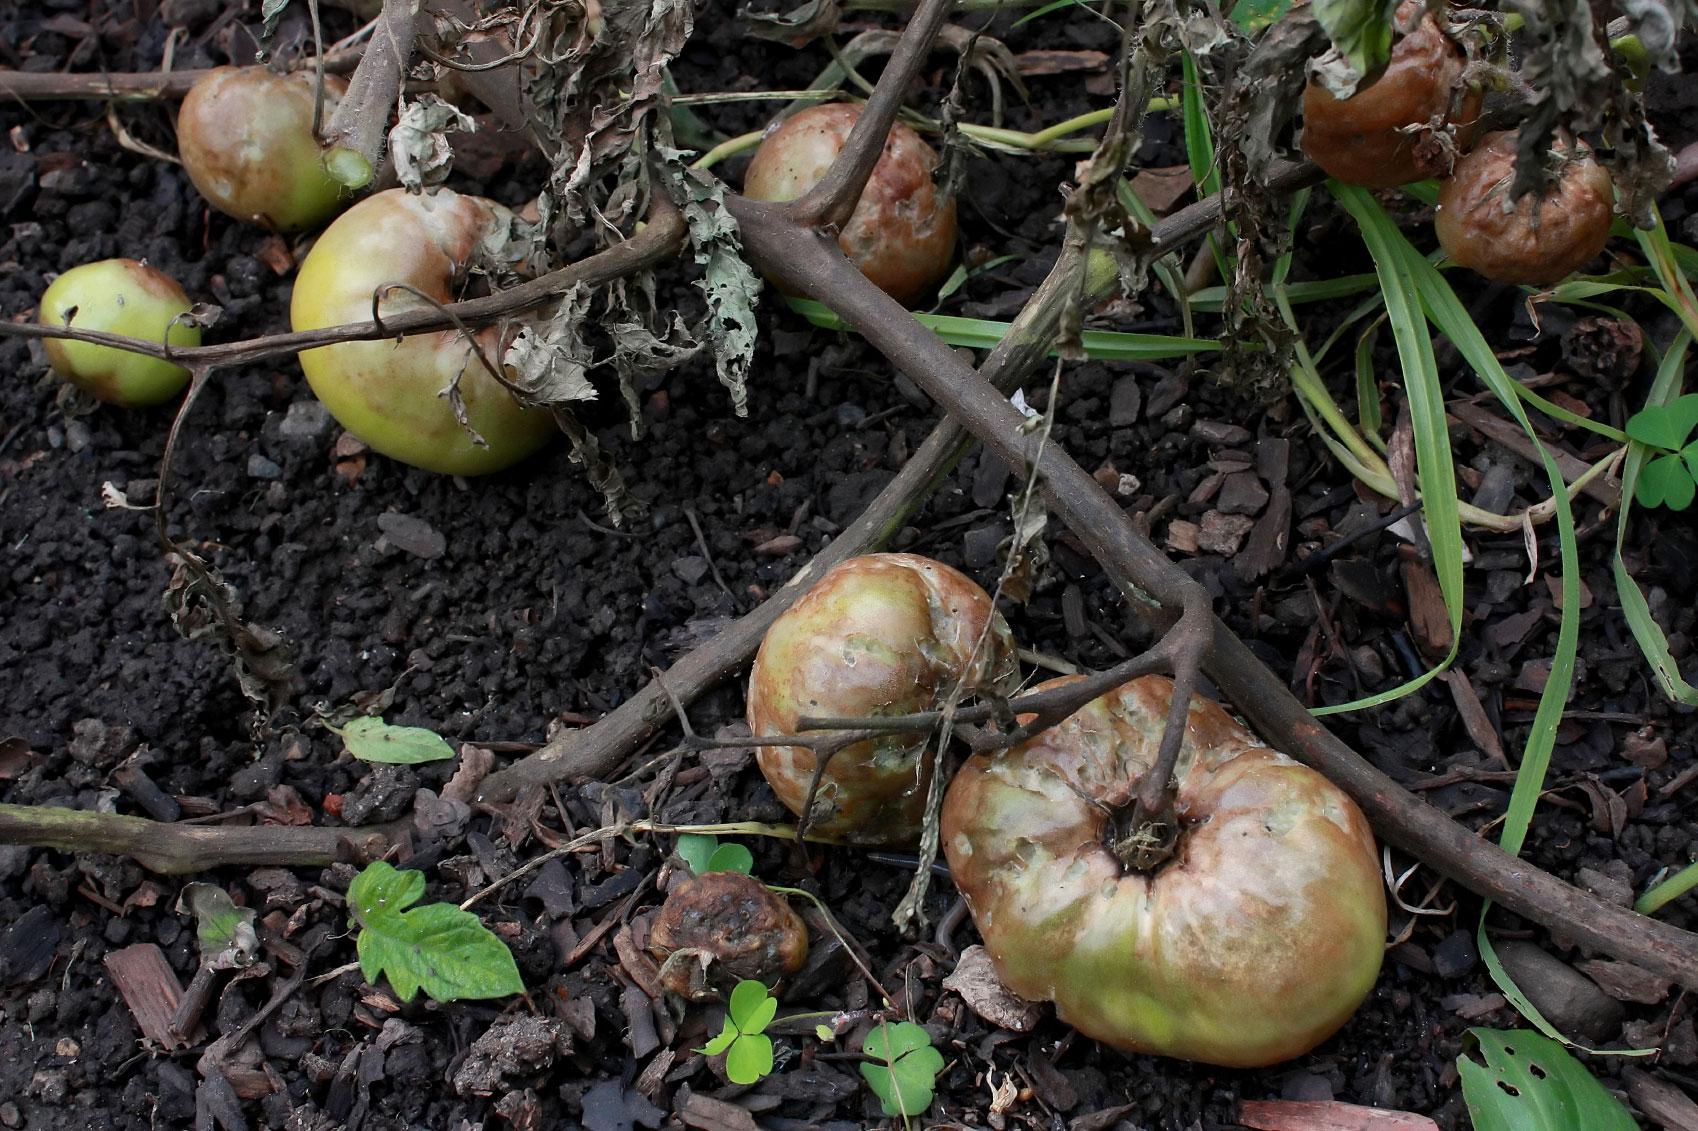 Rotten plants photo